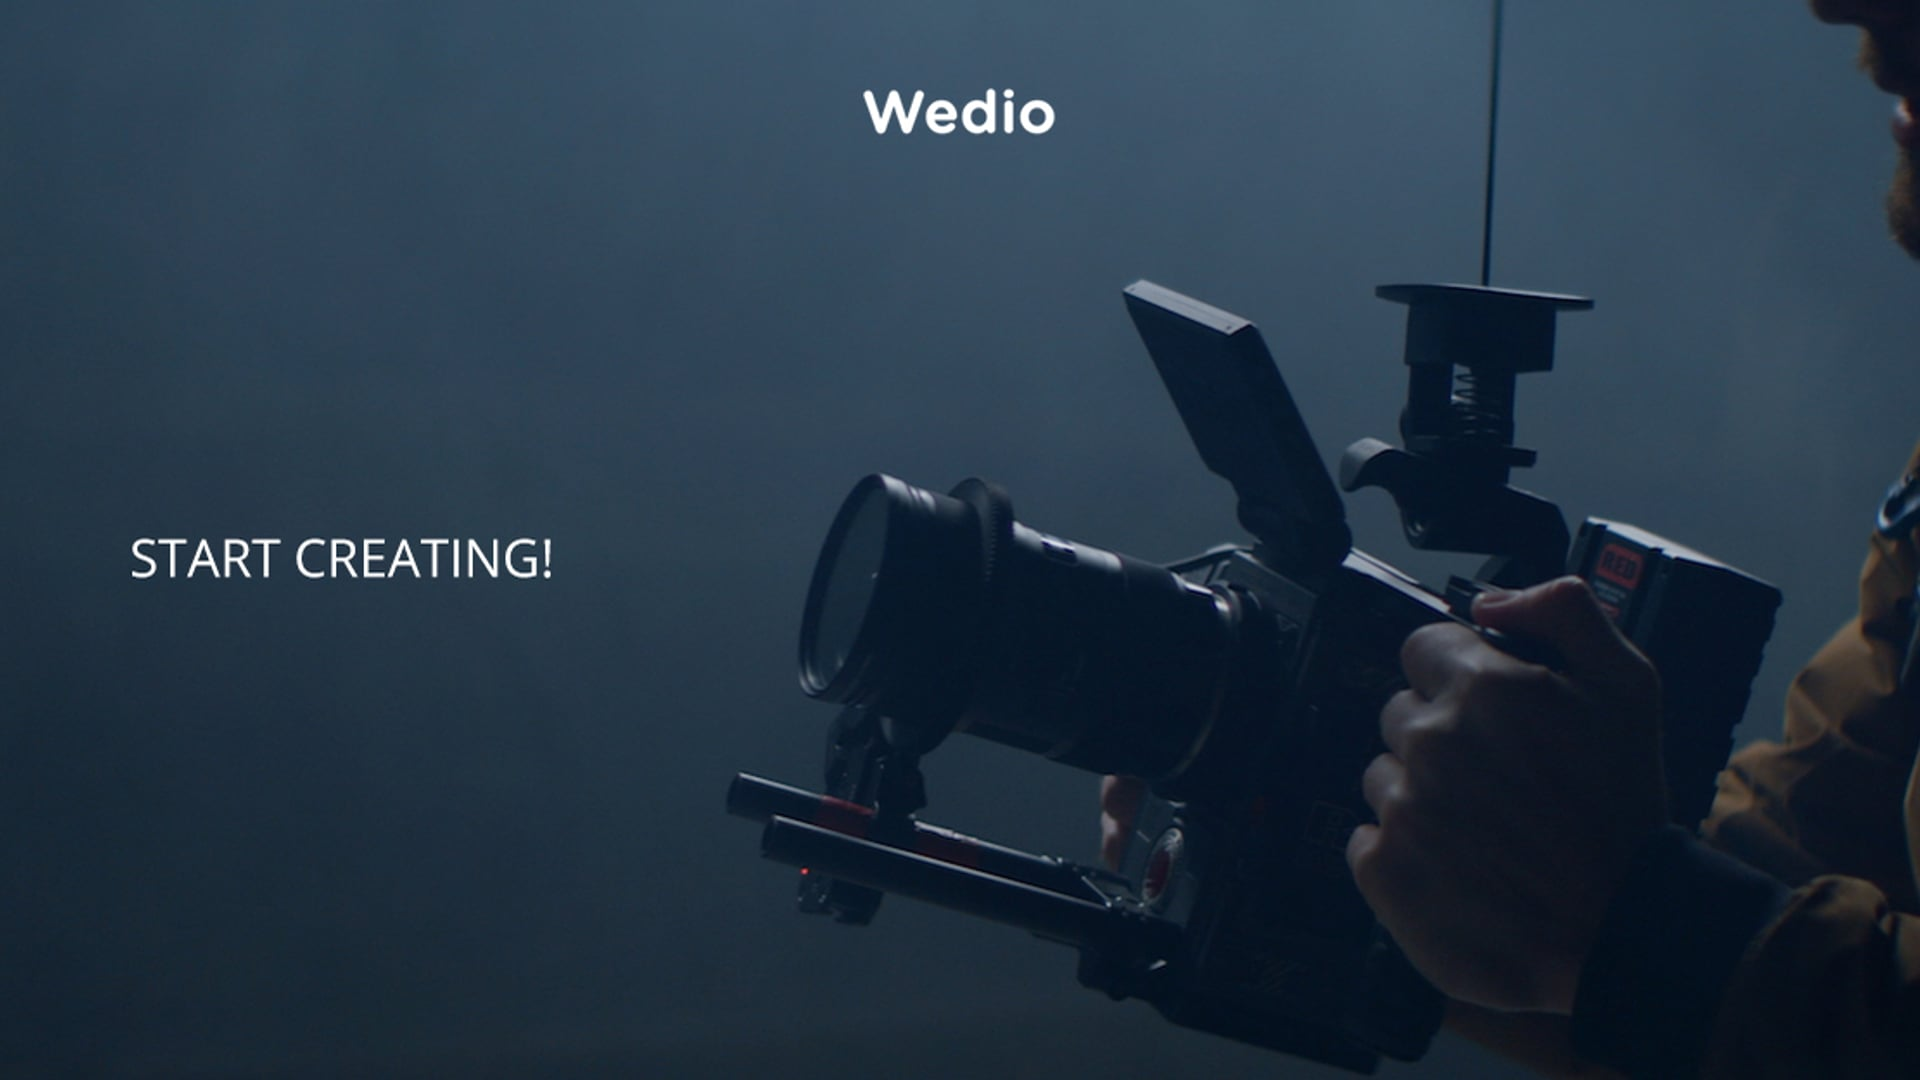 Wedio — start creating!